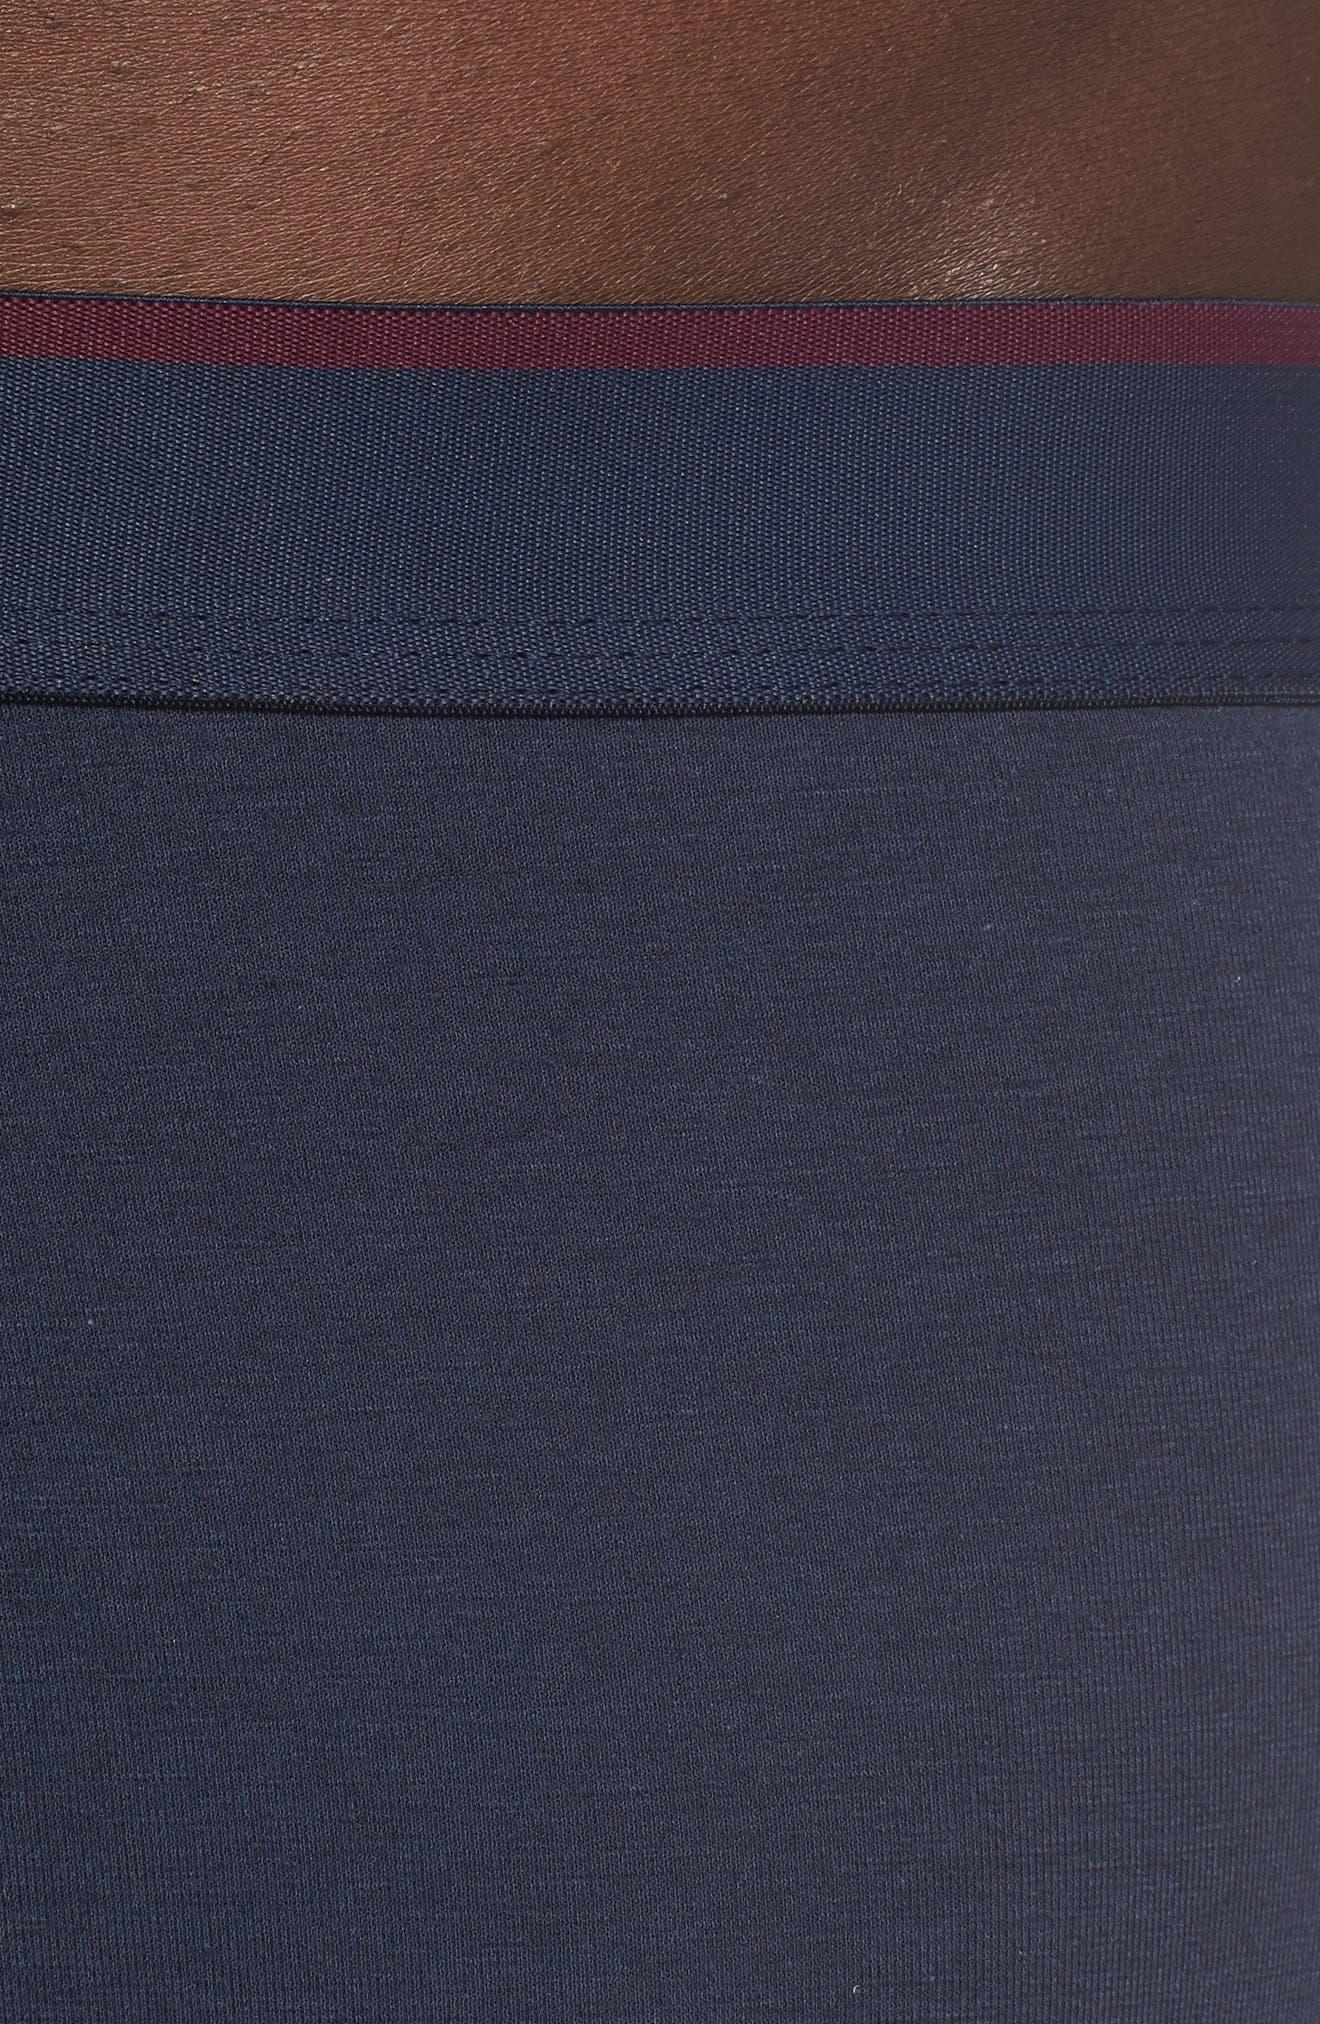 Infinity Cotton Blend Boxer Briefs,                             Alternate thumbnail 4, color,                             NAVY